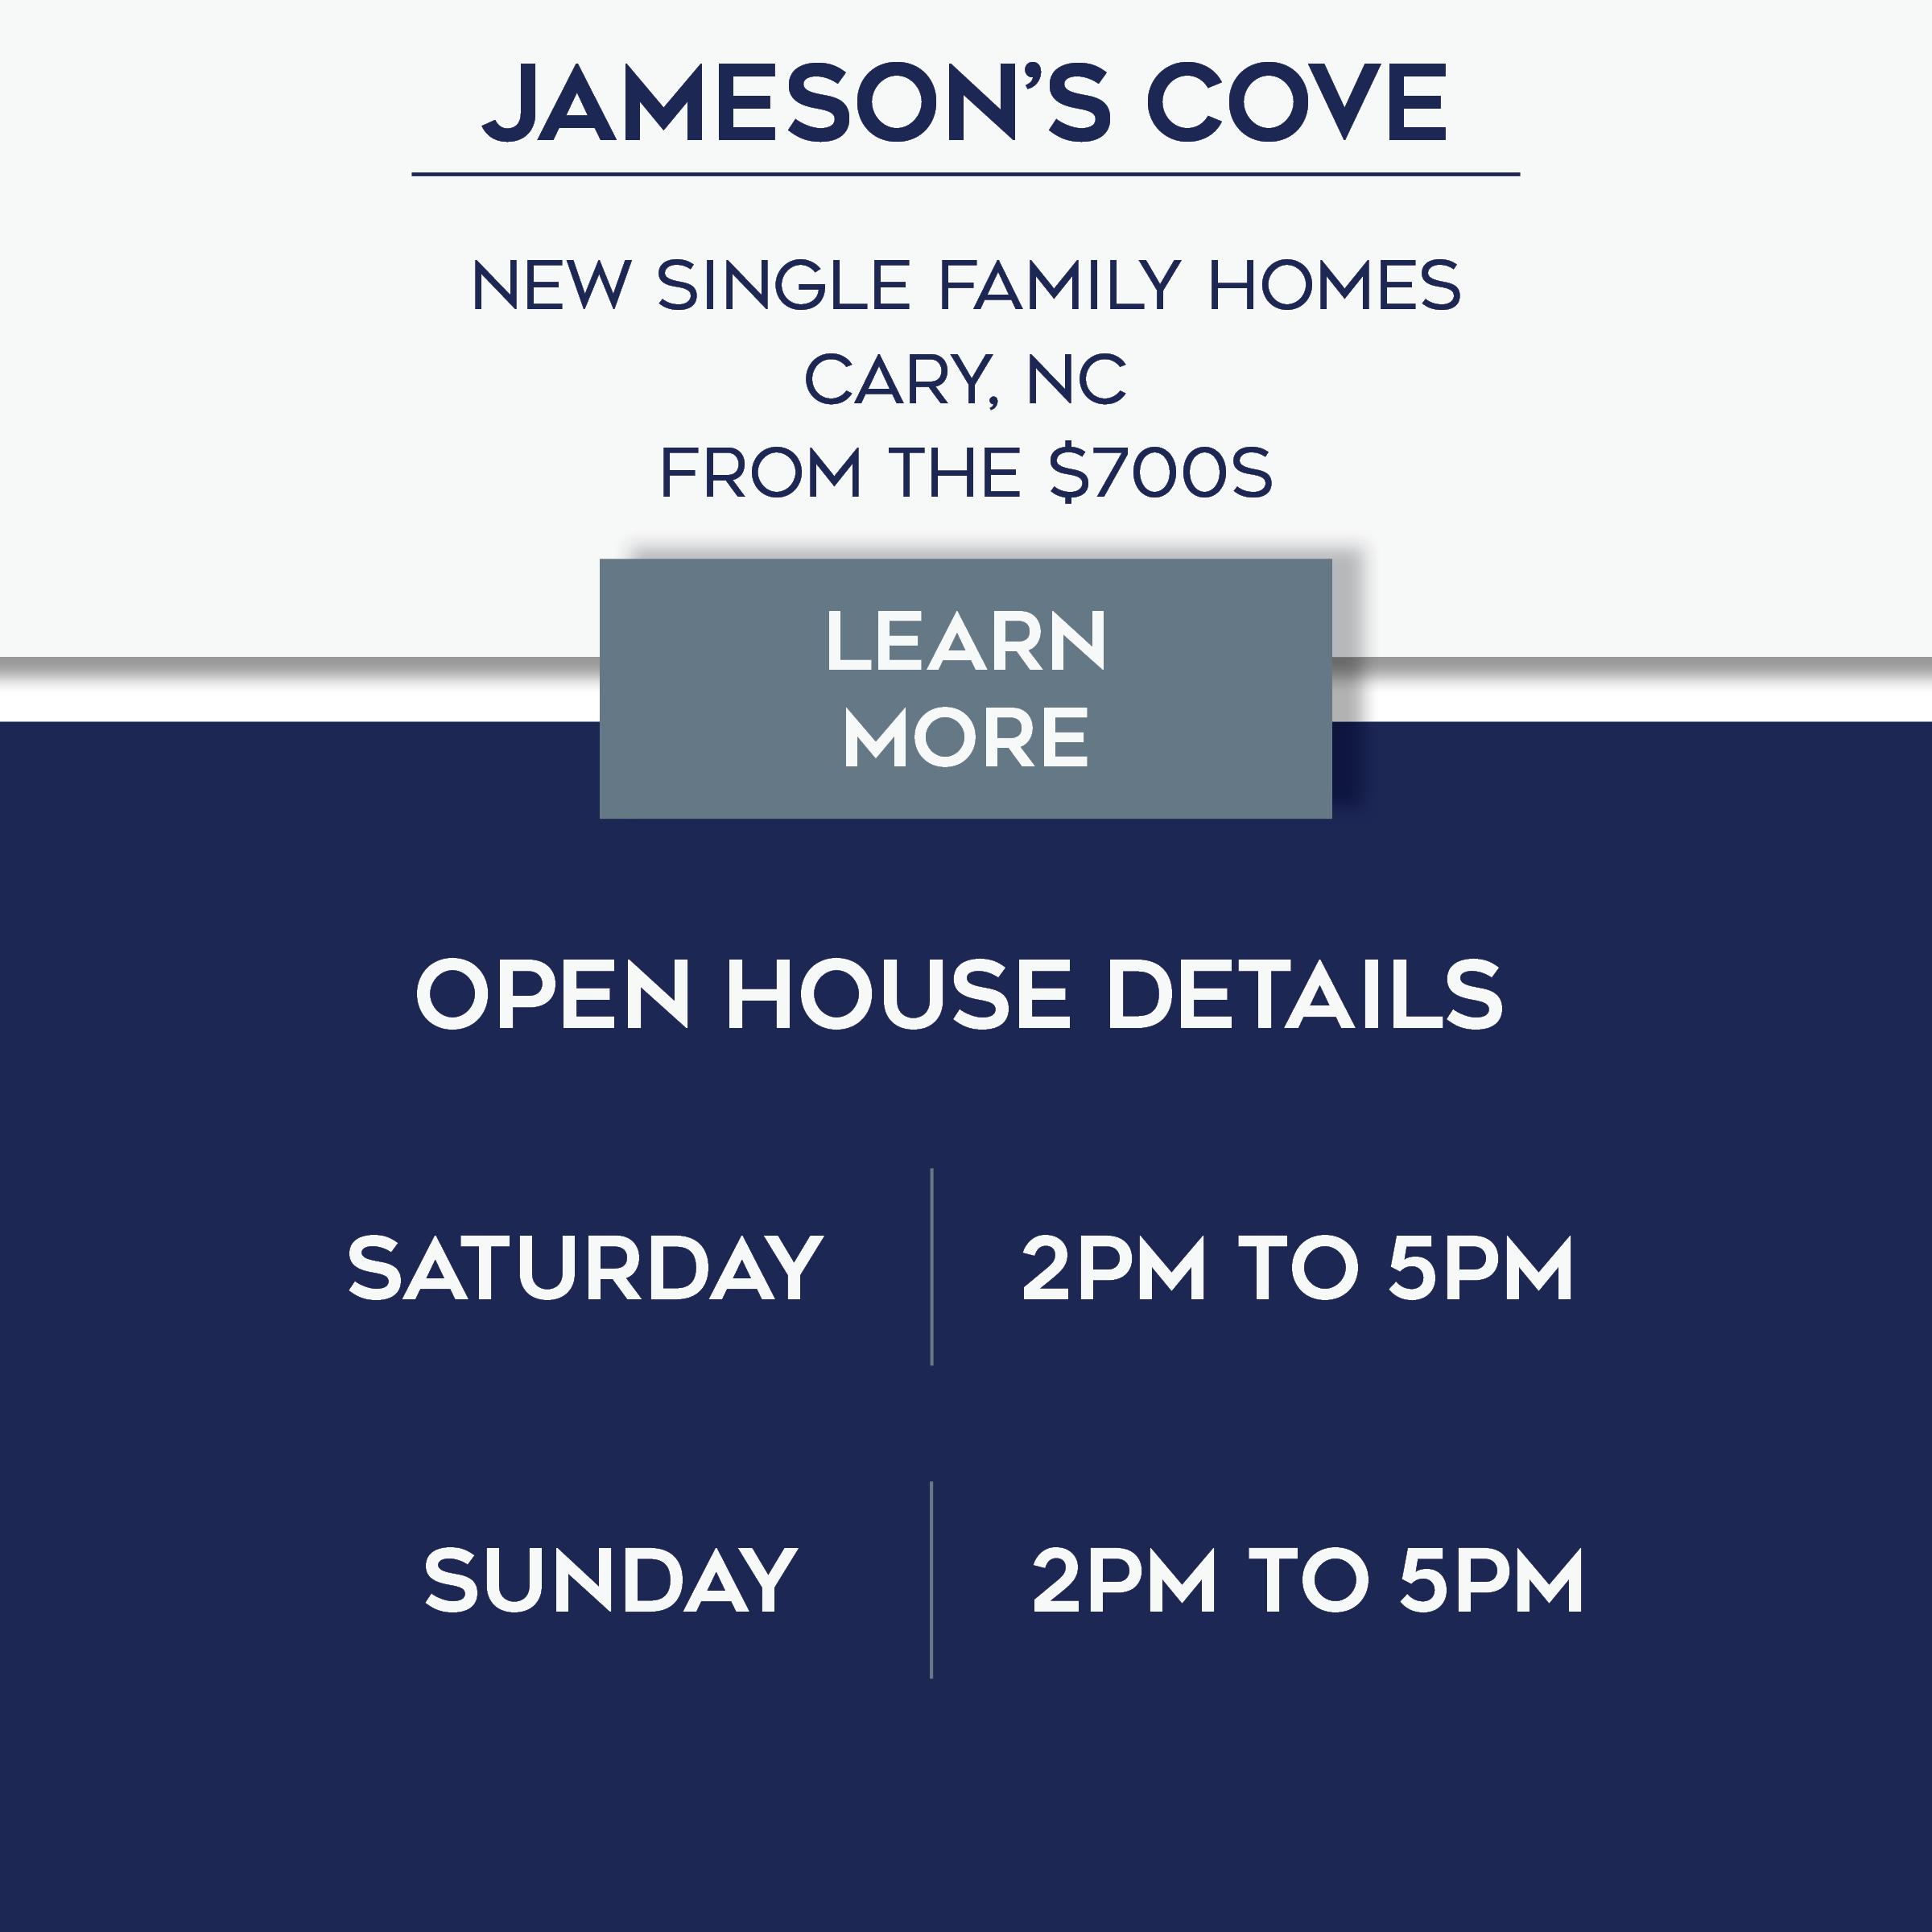 Jameson's Cove Open House